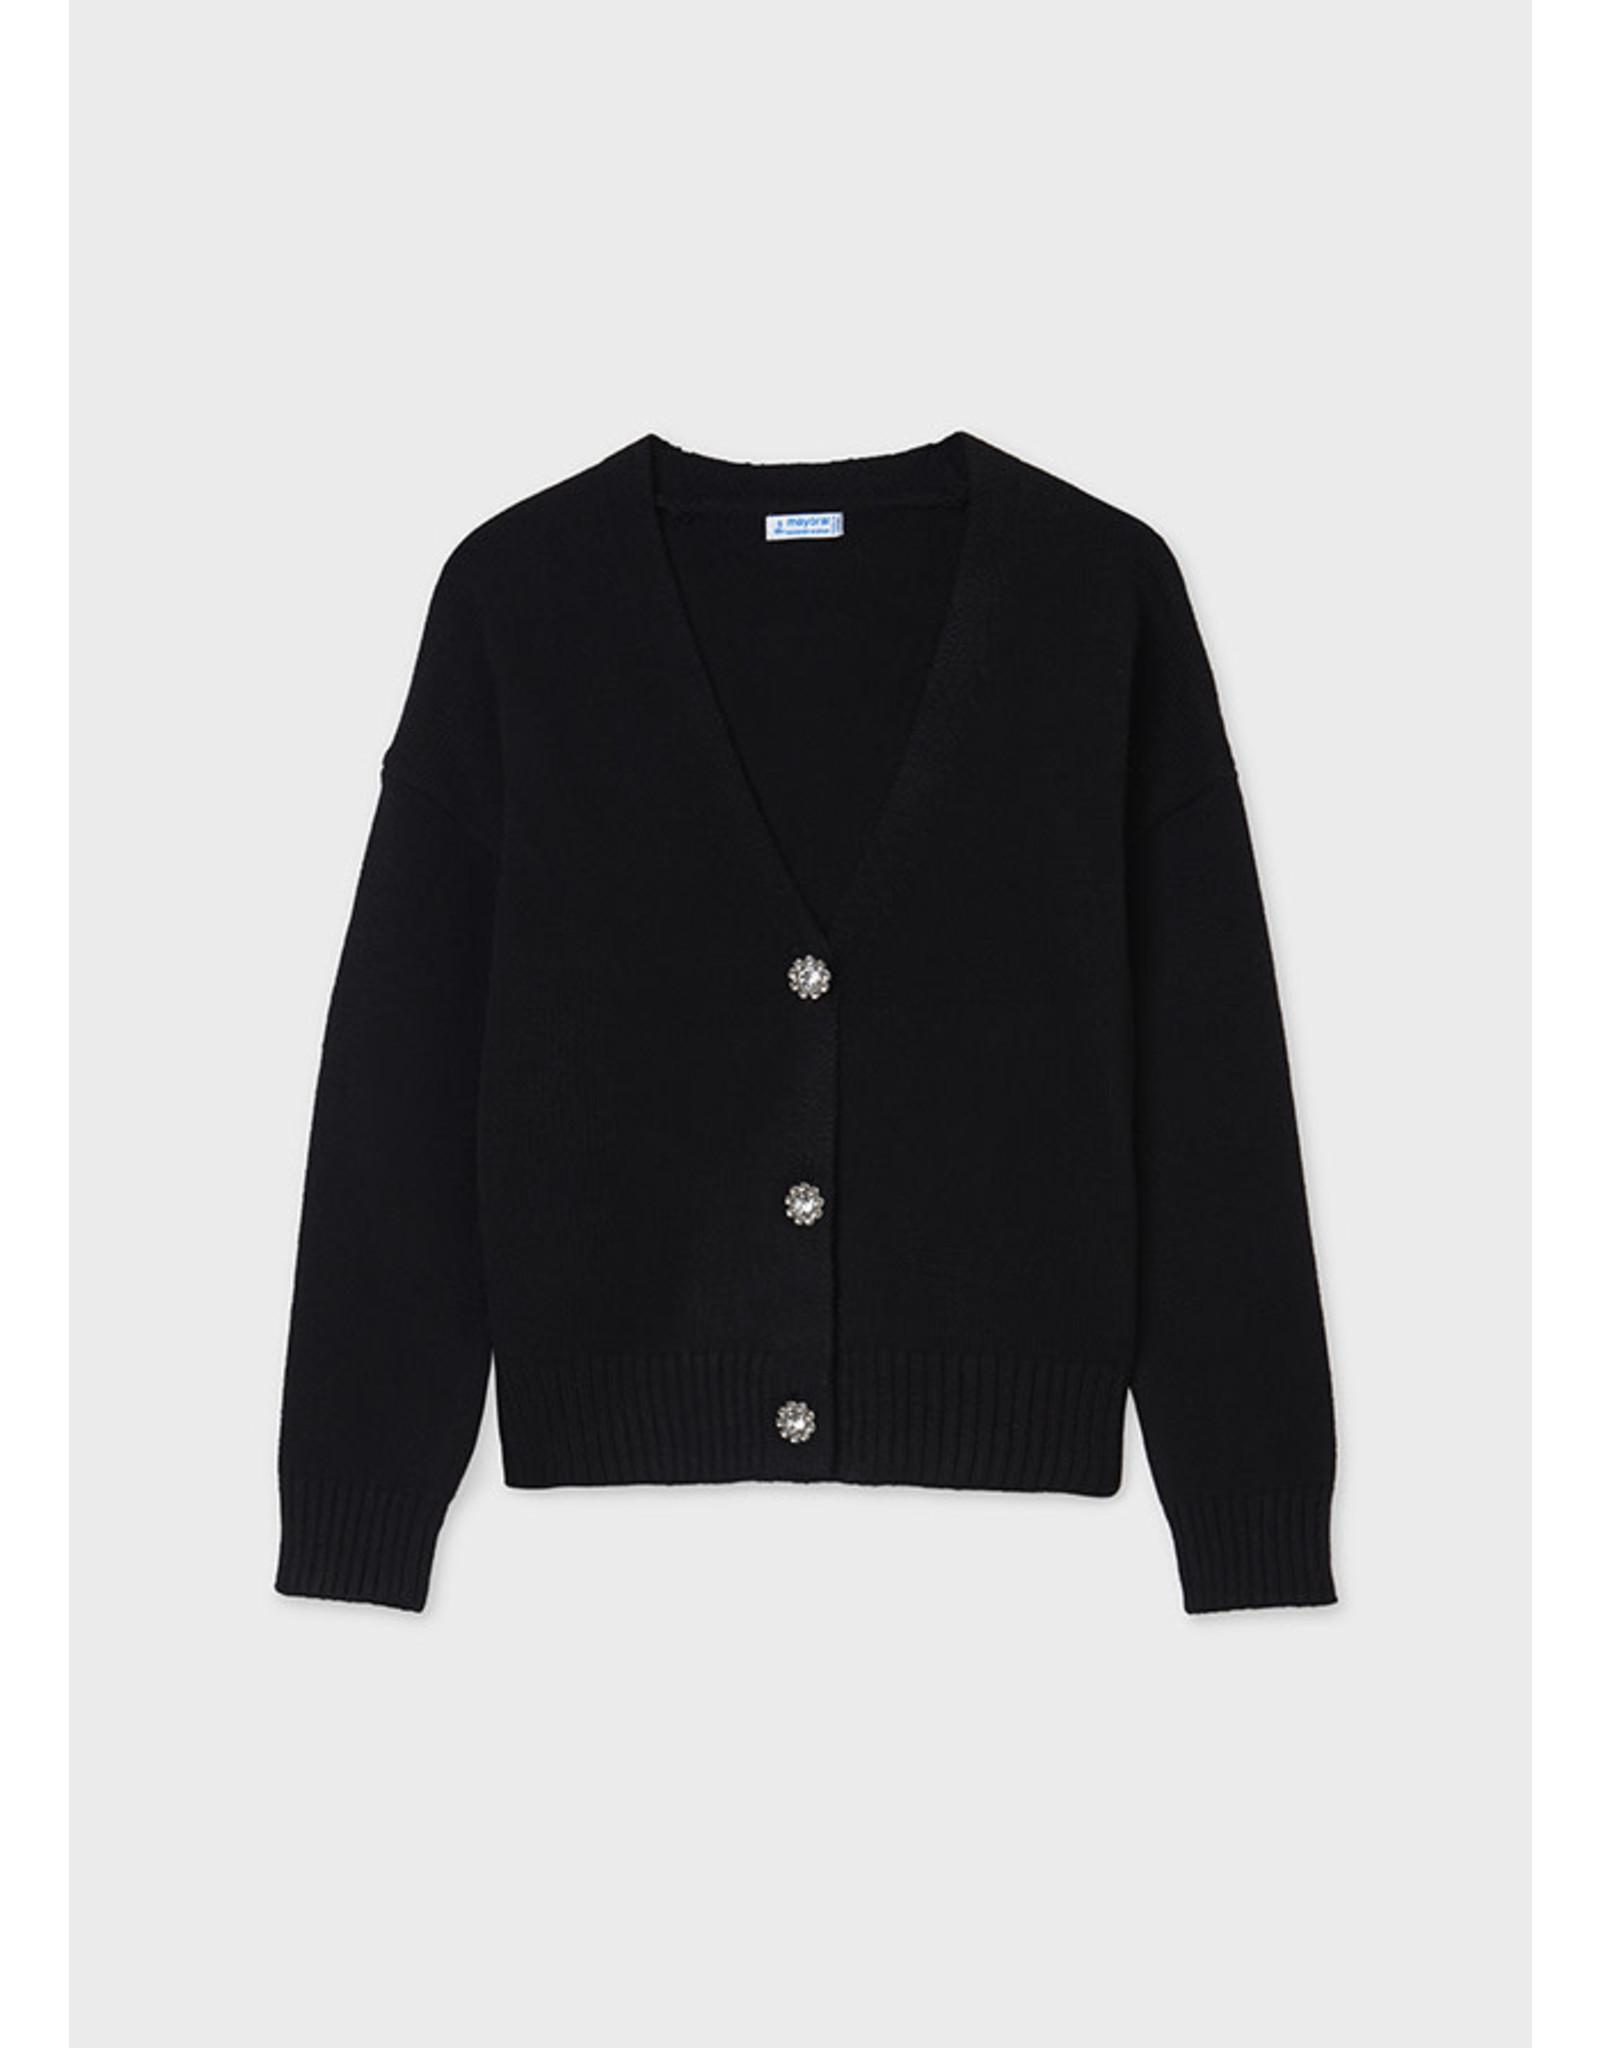 Mayoral Black Knitting cardigan